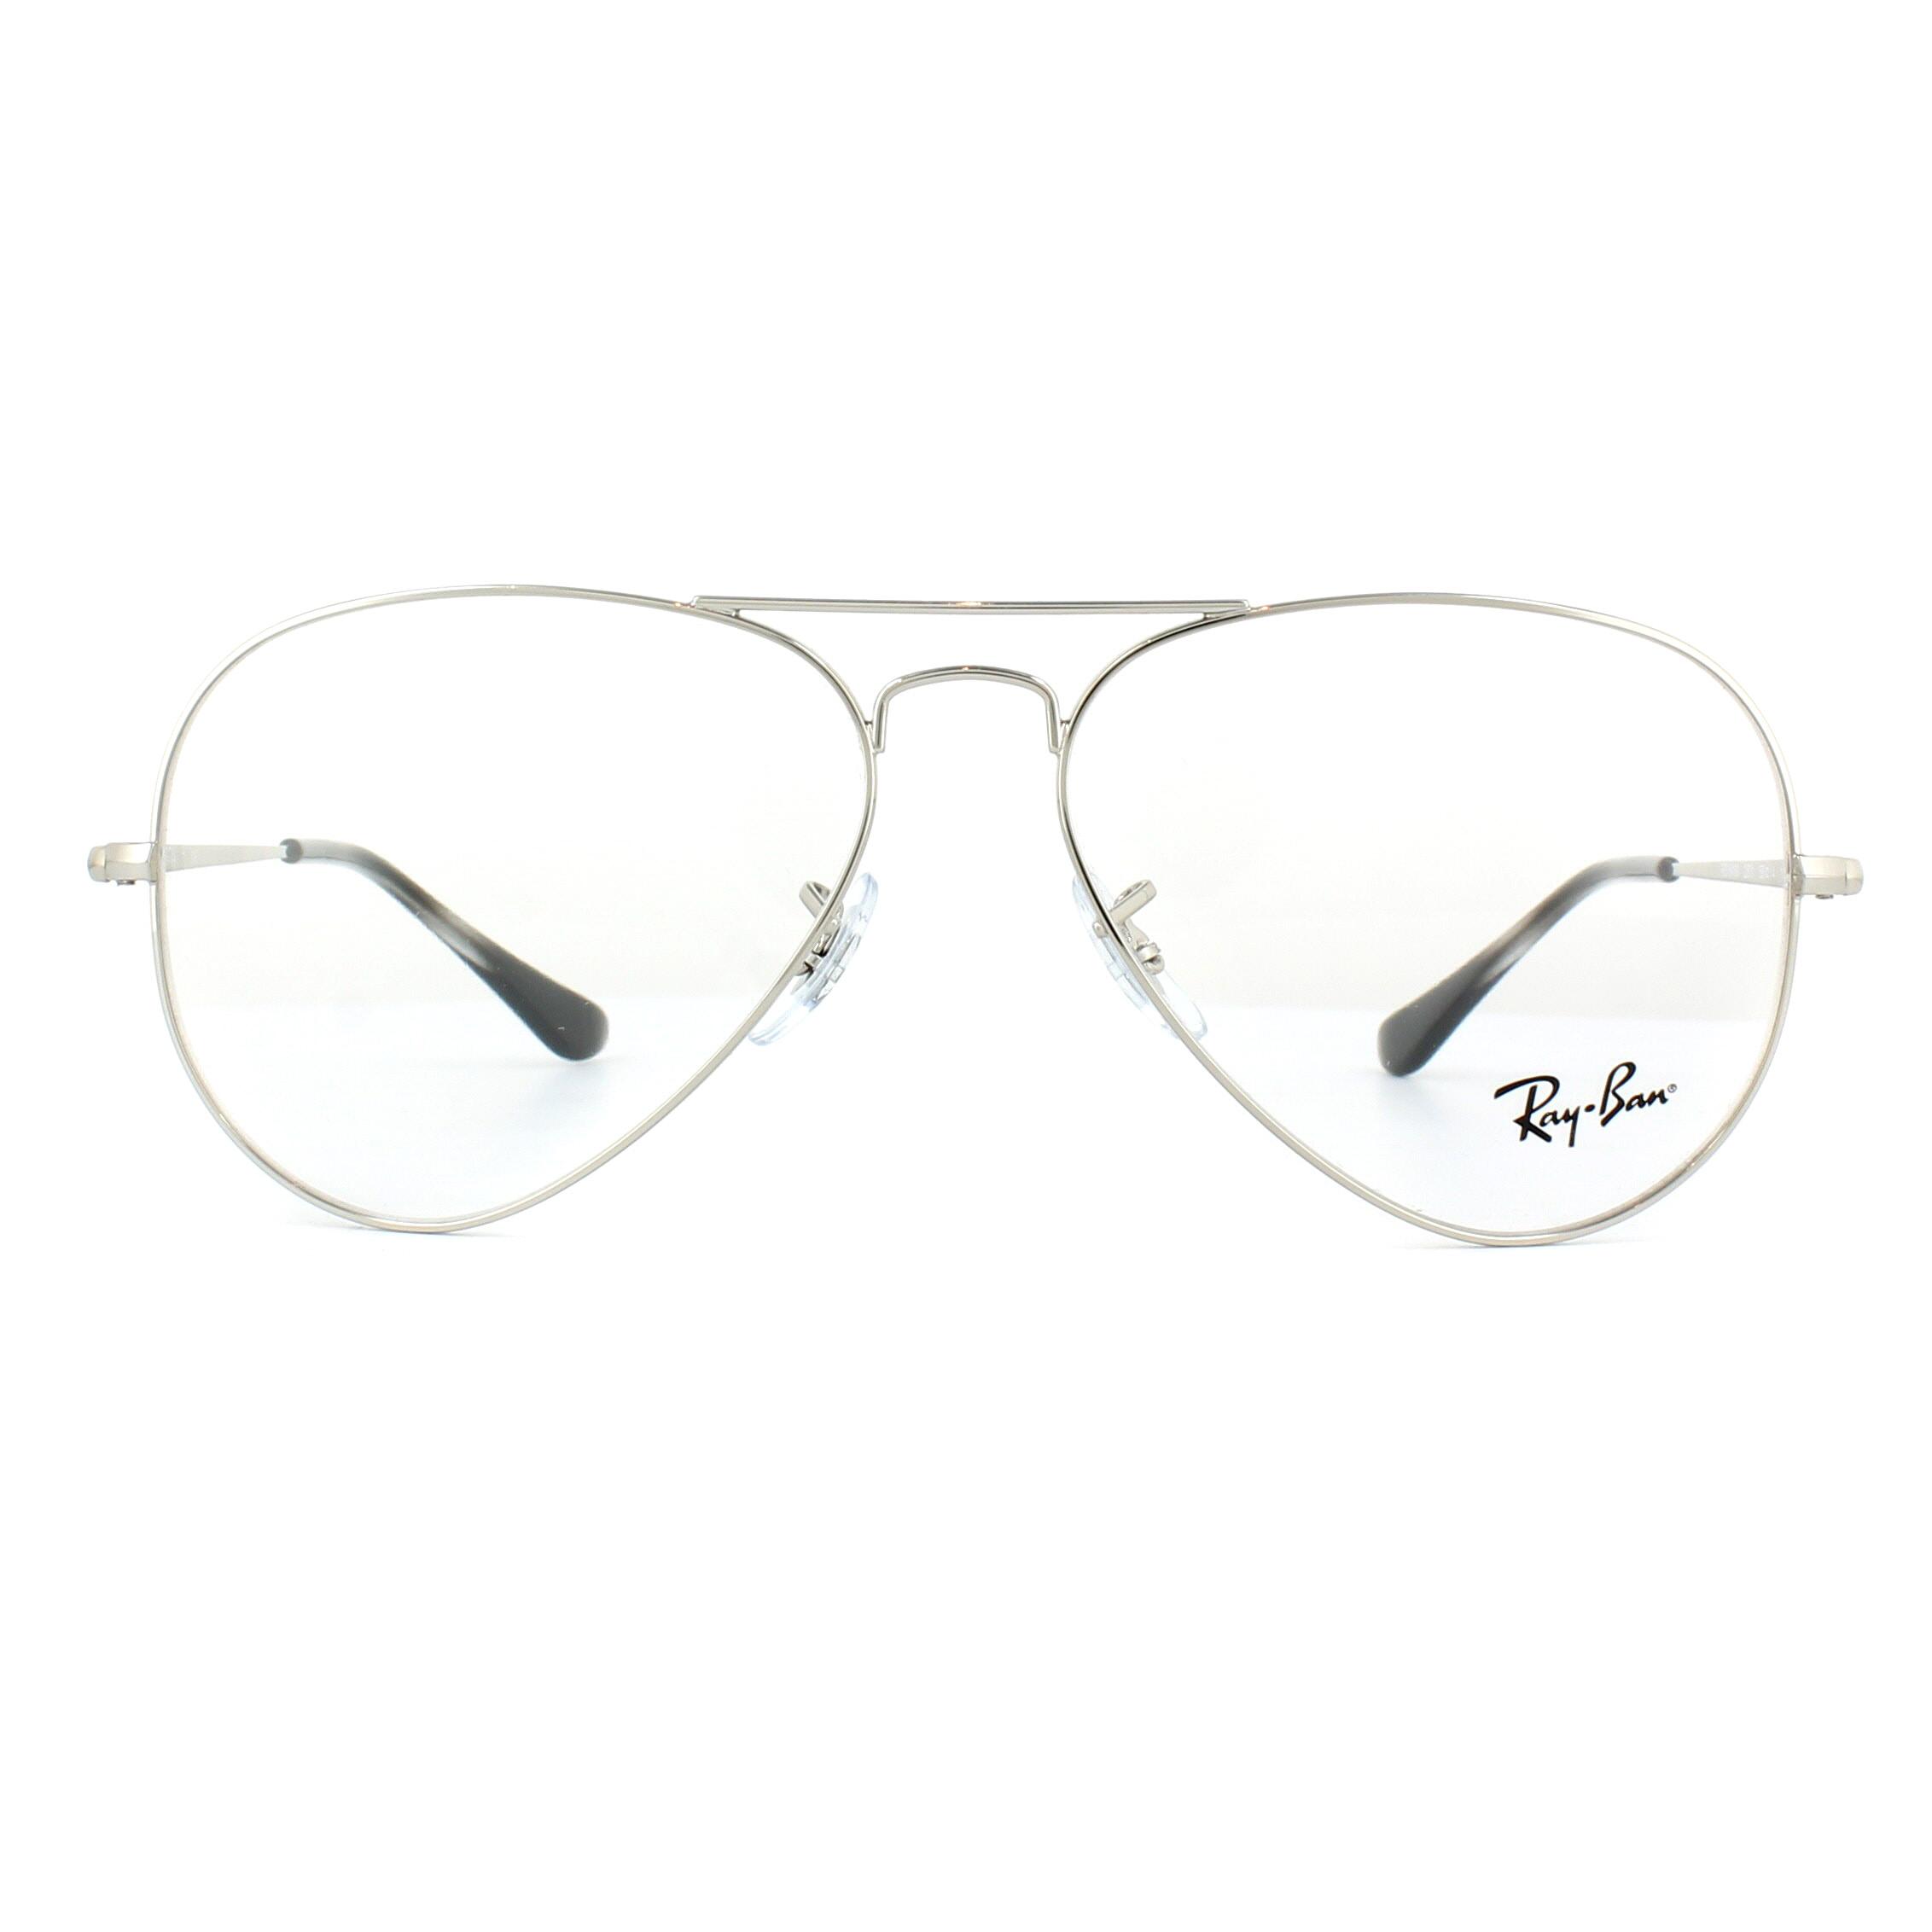 a01fe4e98f9af Sentinel Ray-Ban Glasses Frames 6489 Aviator 2501 Silver 55mm